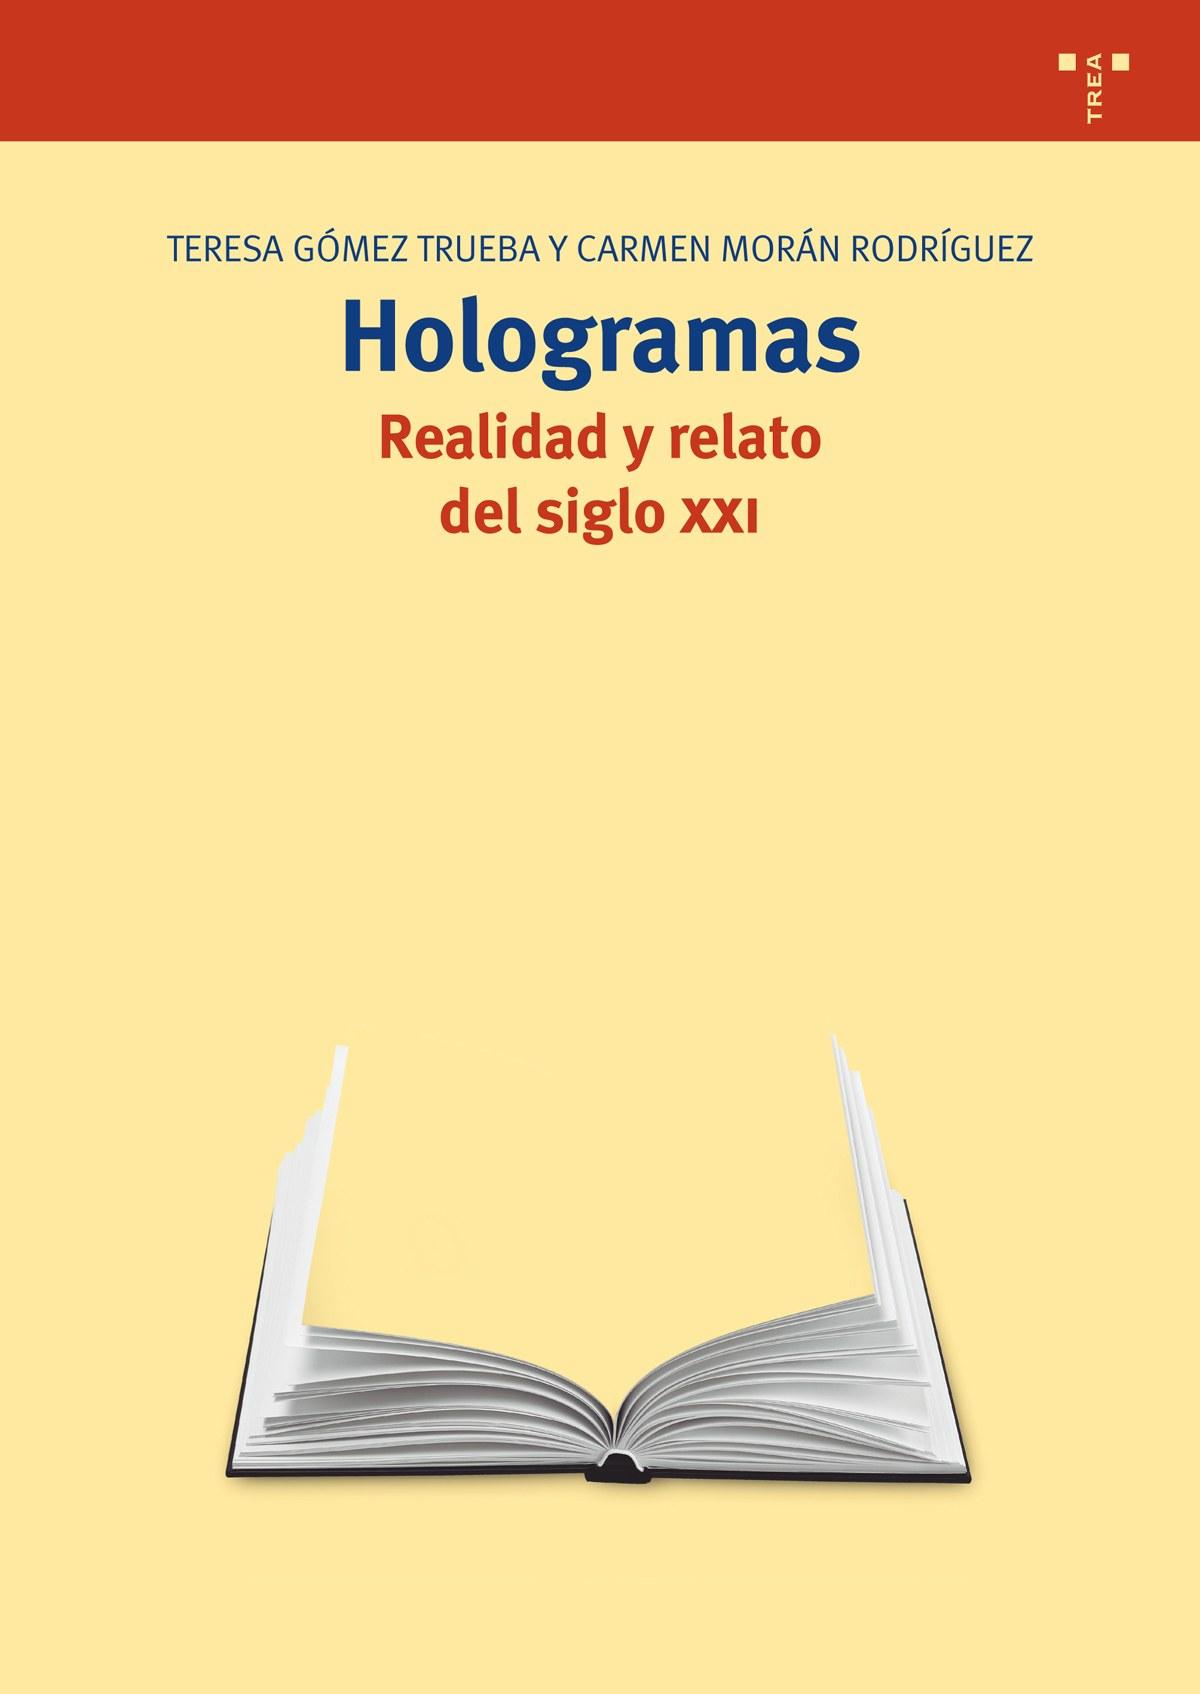 HOLOGRAMAS 9788497049870